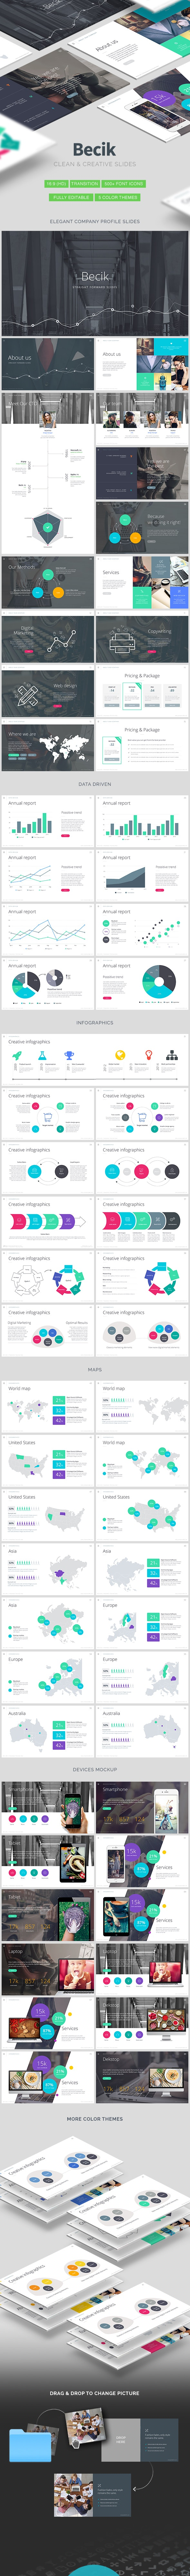 Becik - Creative Keynote Template - Keynote Templates Presentation Templates